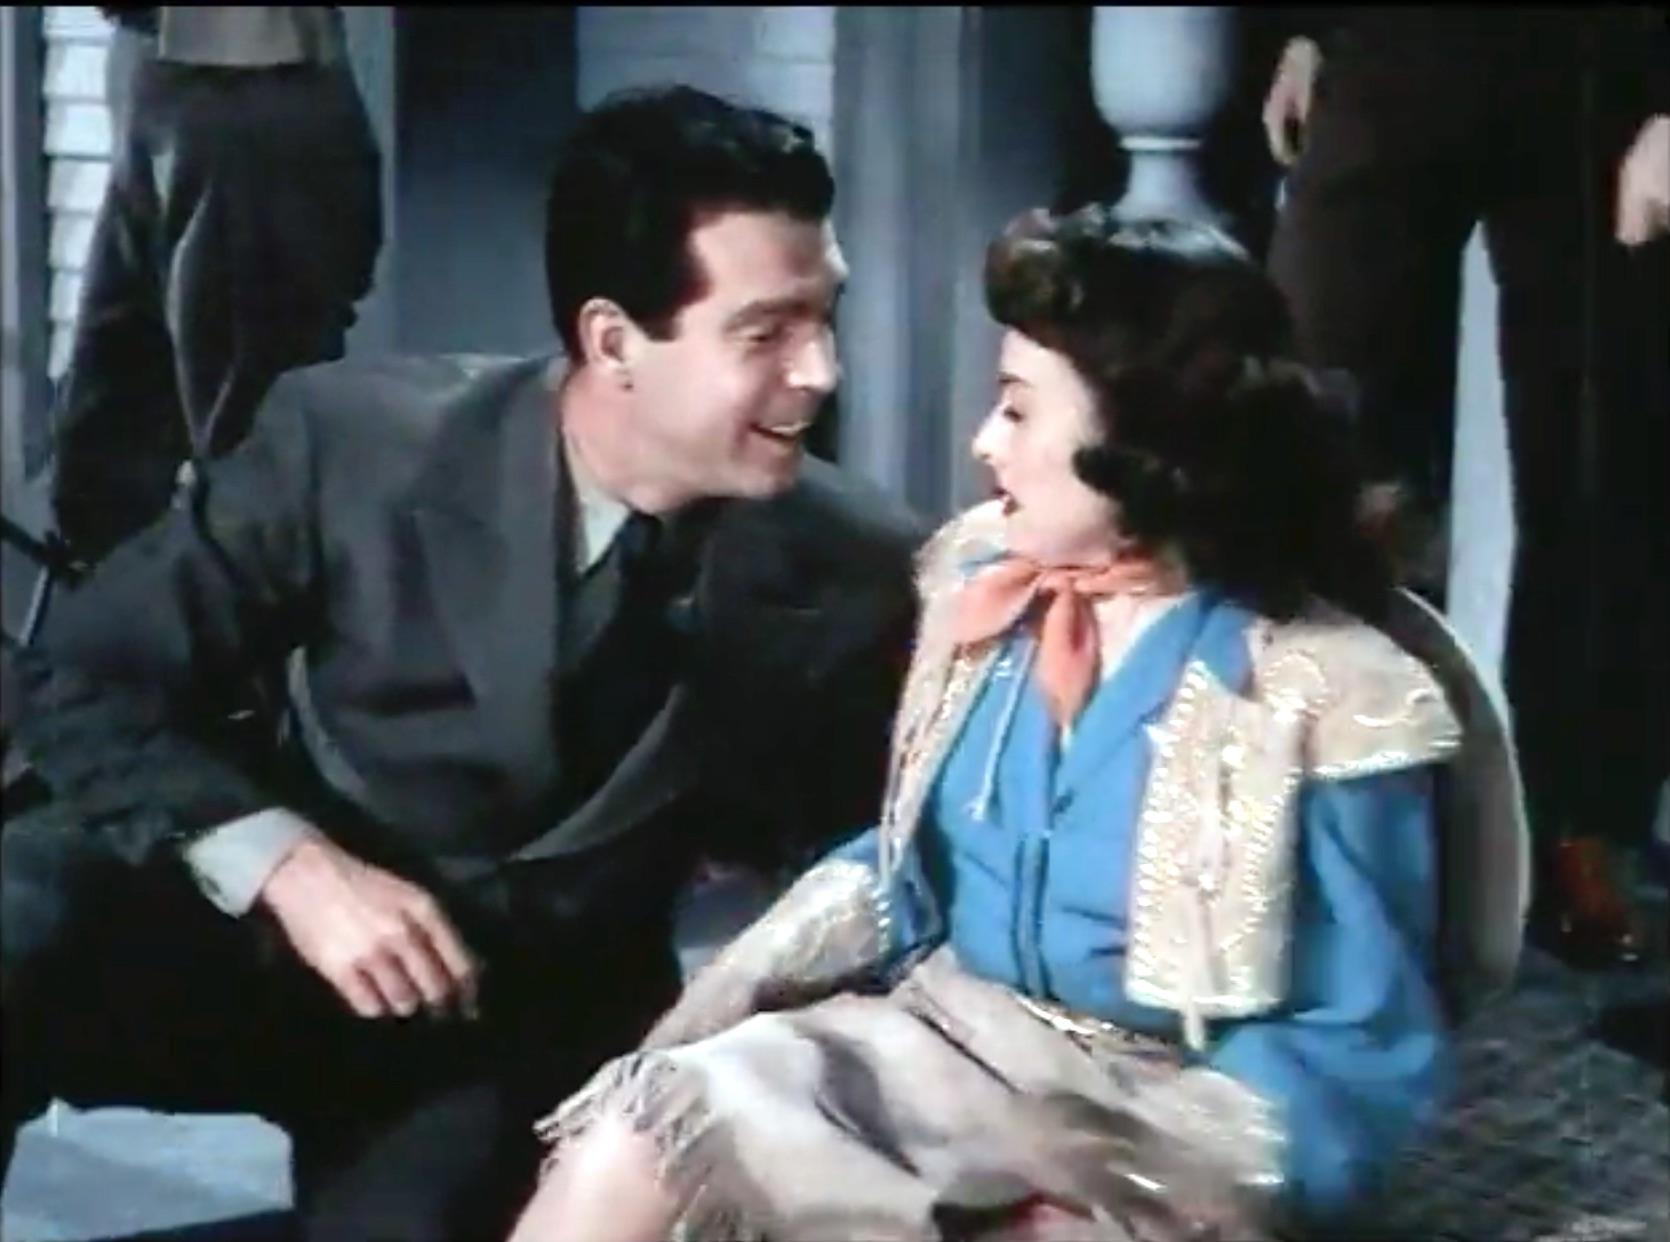 Celia Huston (Paulette Goddard) falls for Don Stuart (Fred MacMurray) literally, at the parade